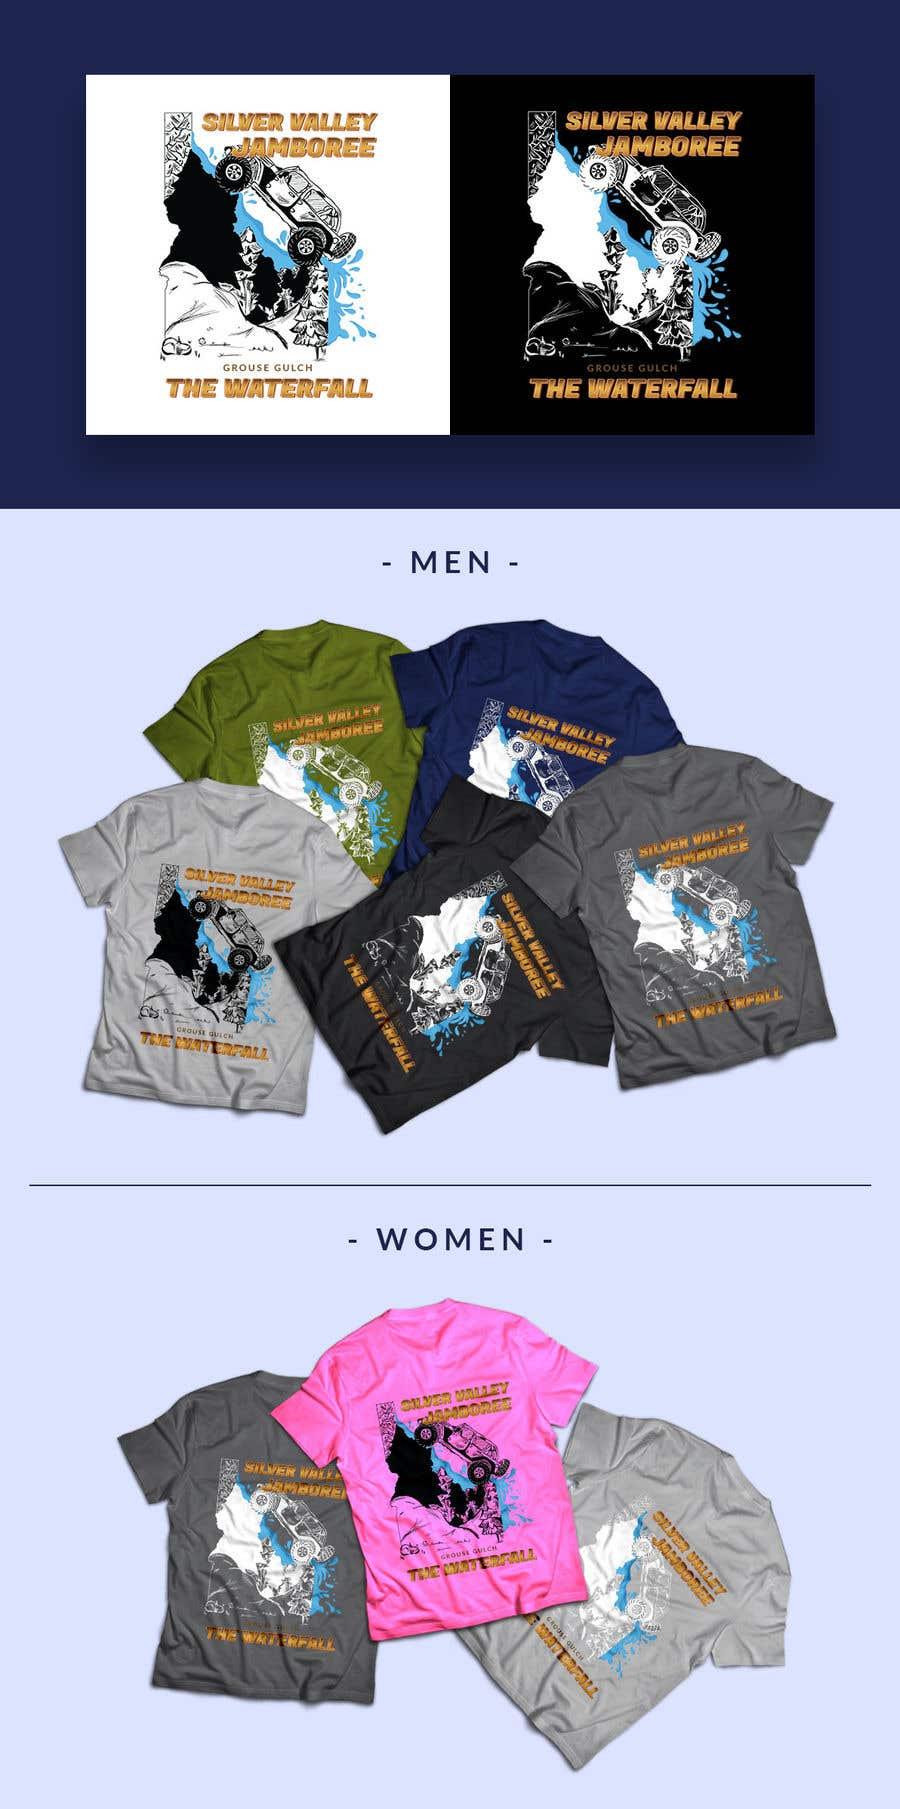 Konkurrenceindlæg #                                        54                                      for                                         Design for an event tee shirt